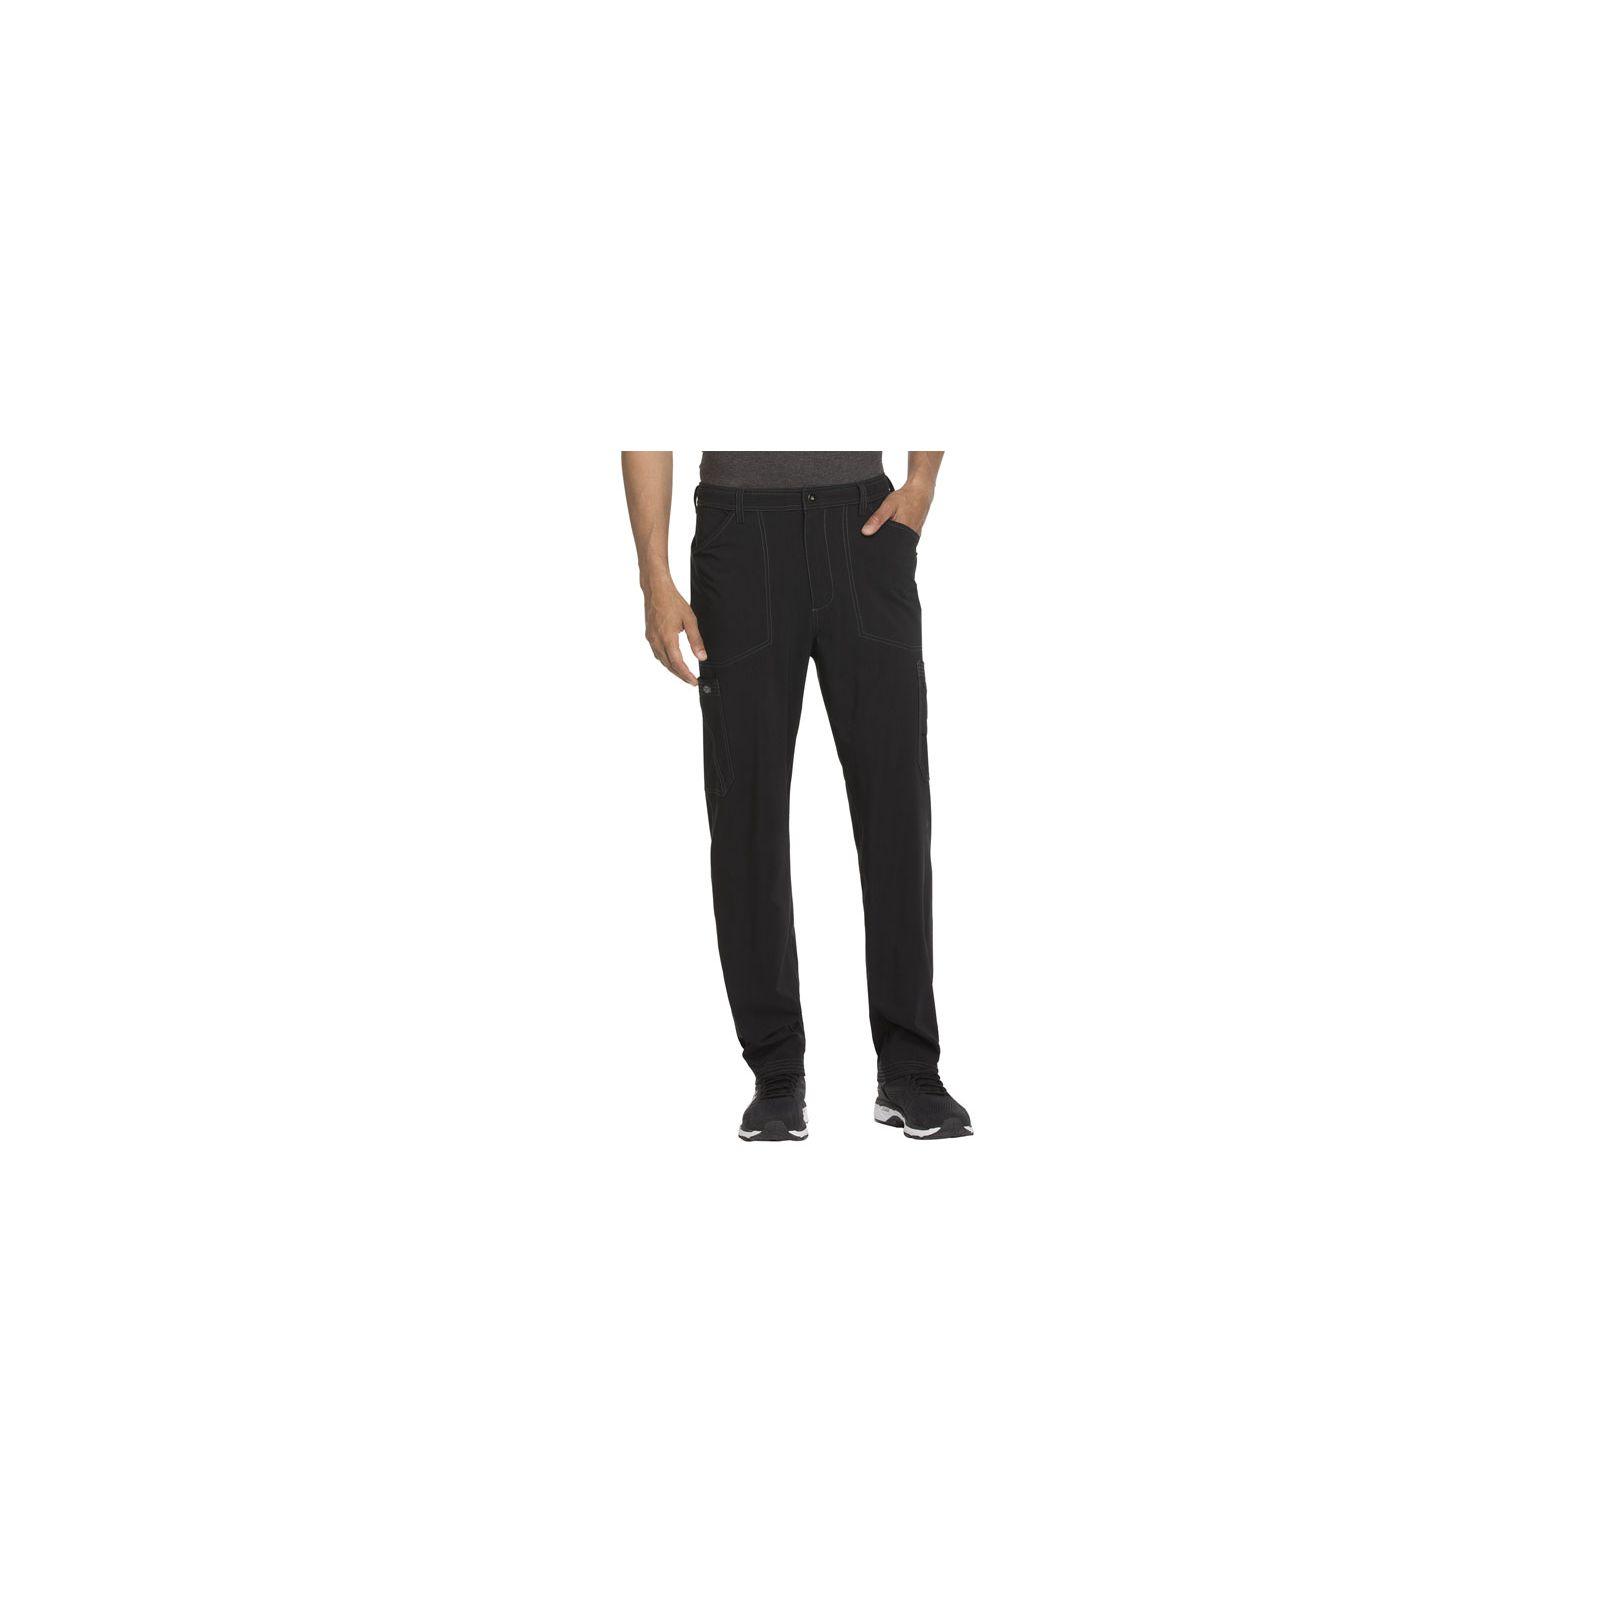 "Pantalon médical homme uni, Dickies, ""Dickies Advance"" (DK205)"